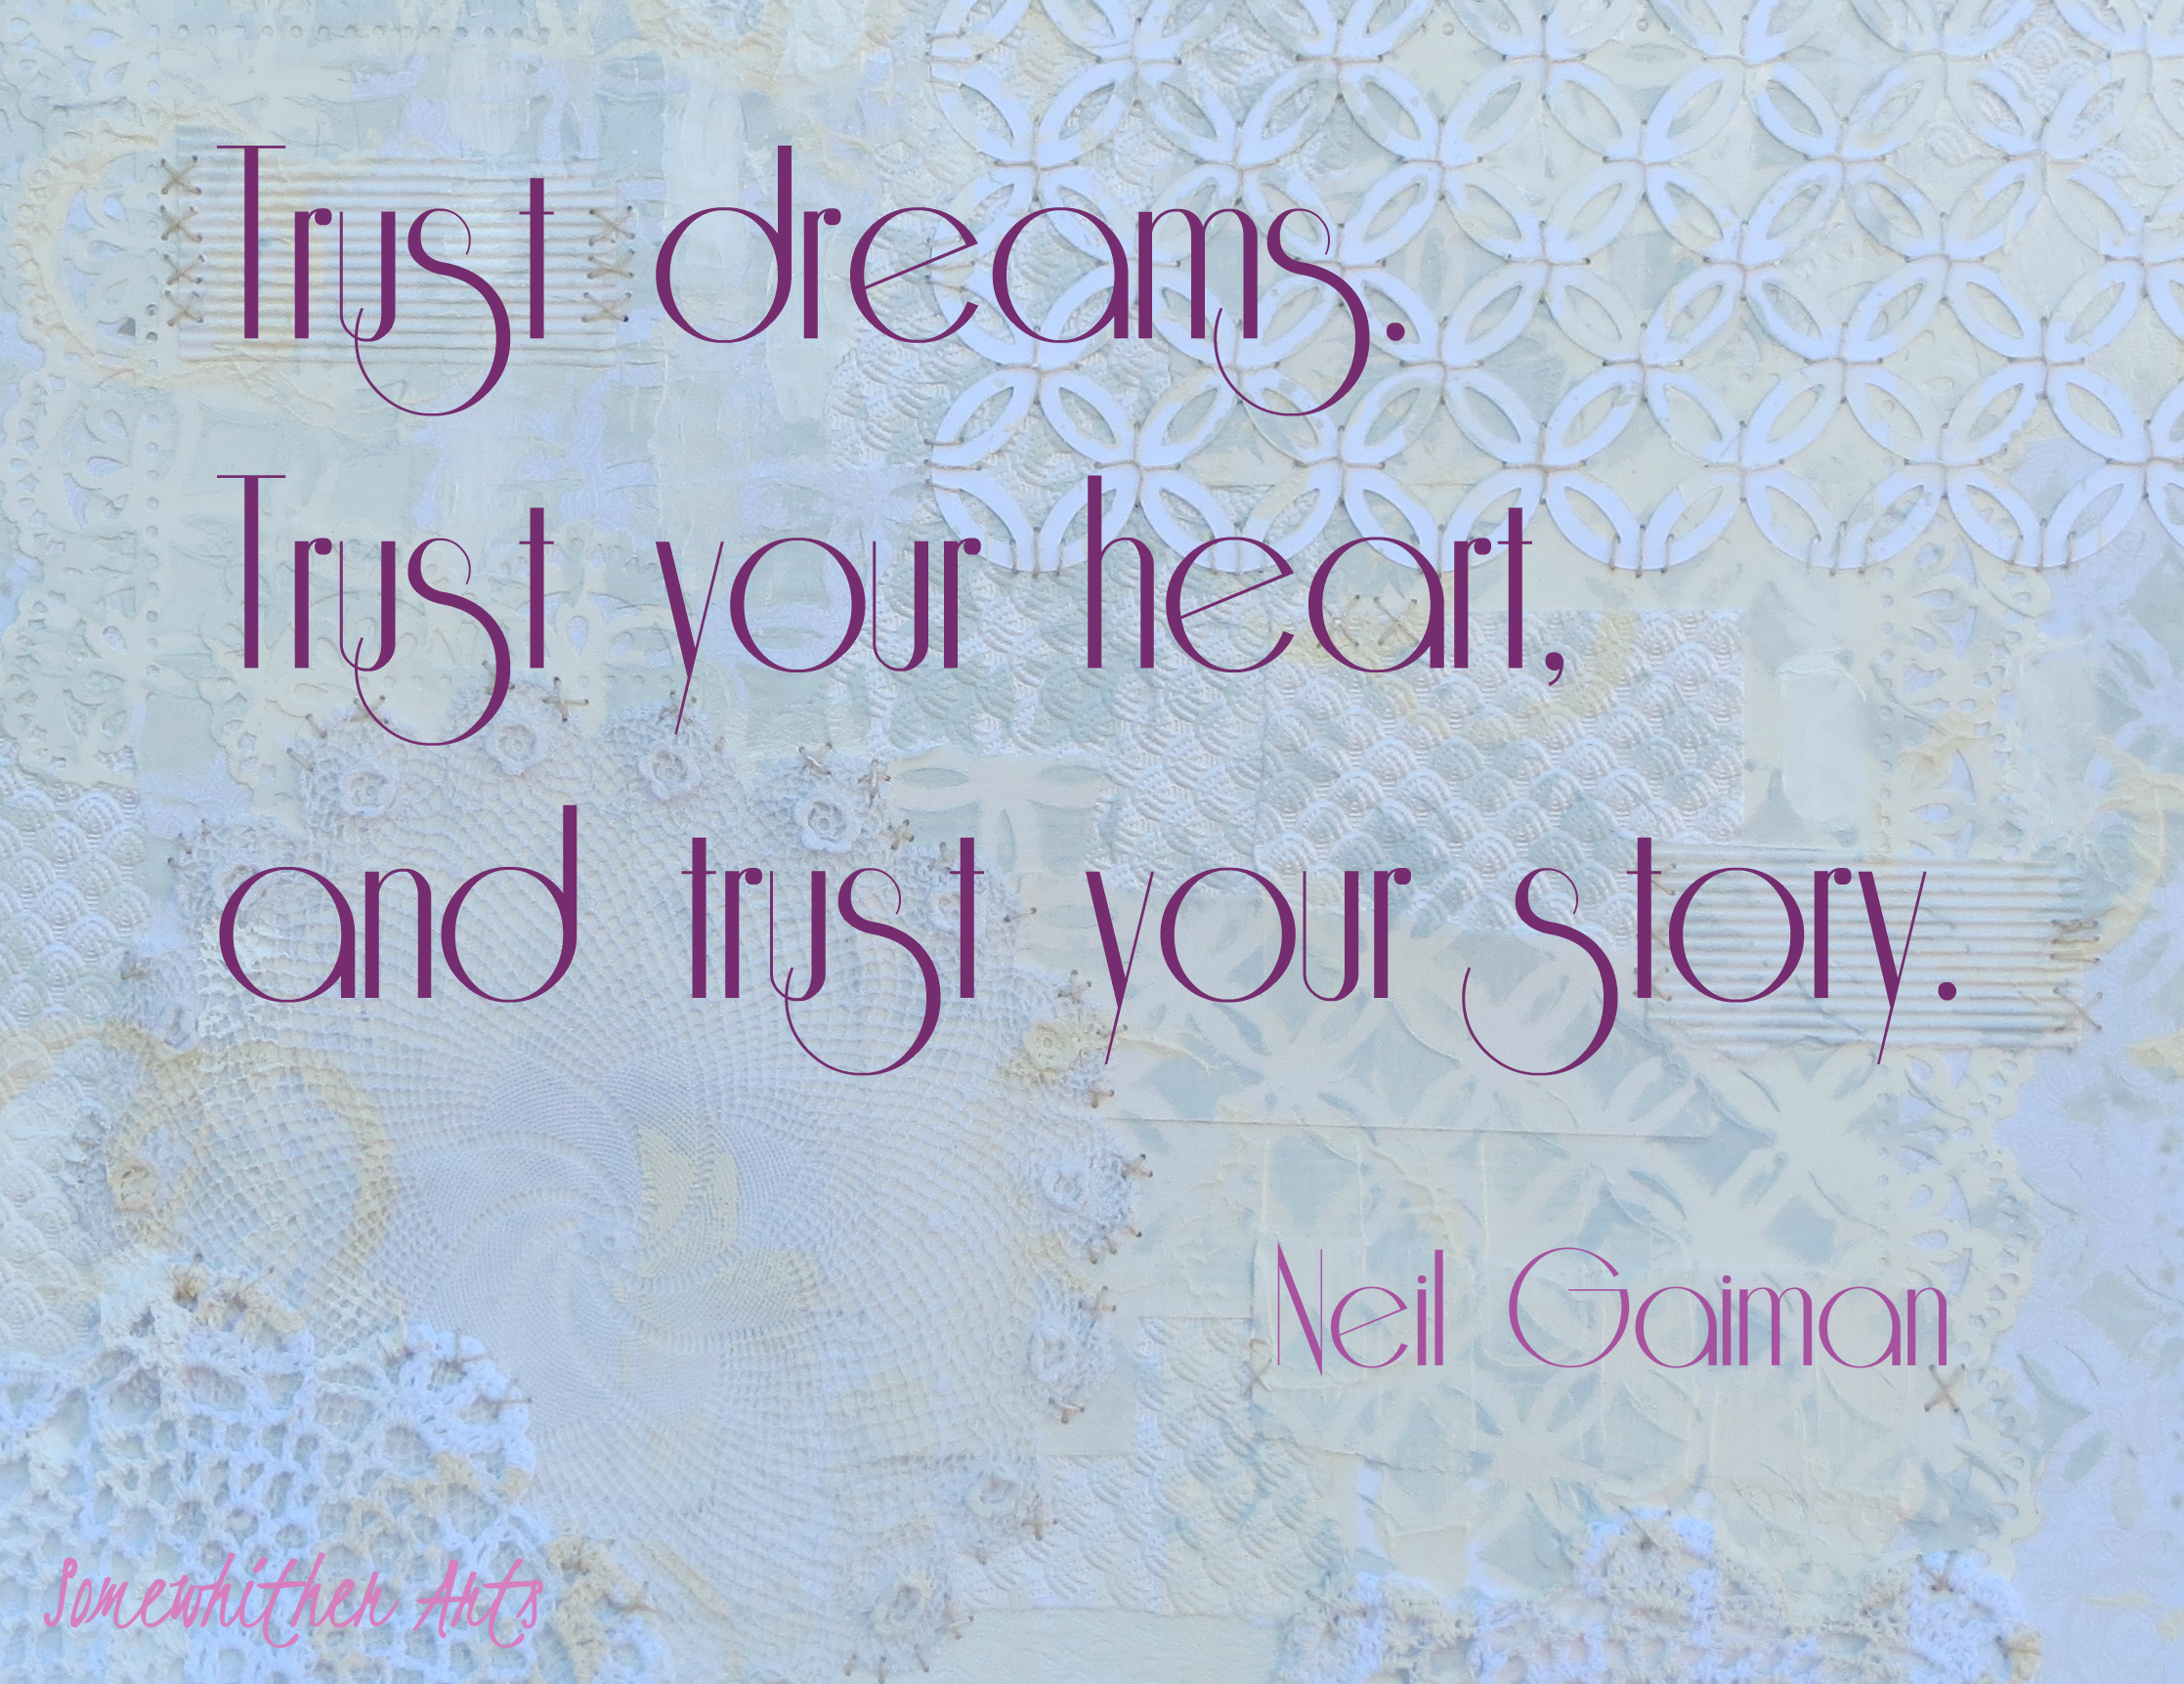 trust dreams